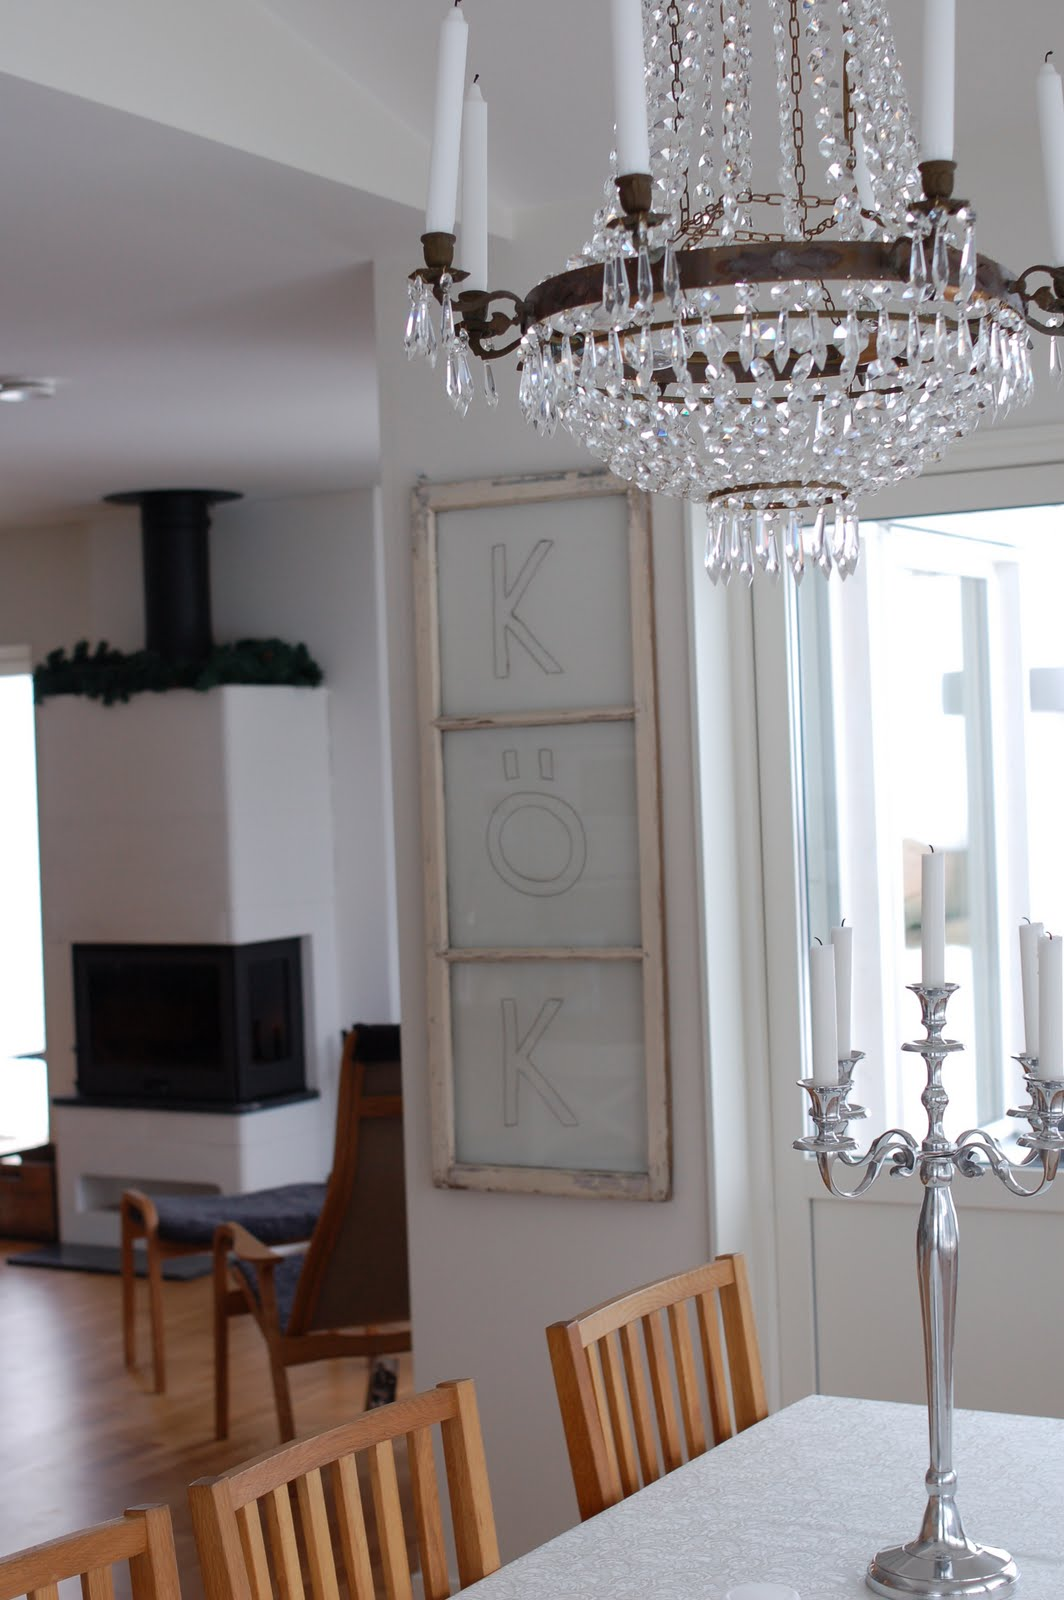 frenberg.com: Gammalt fönster